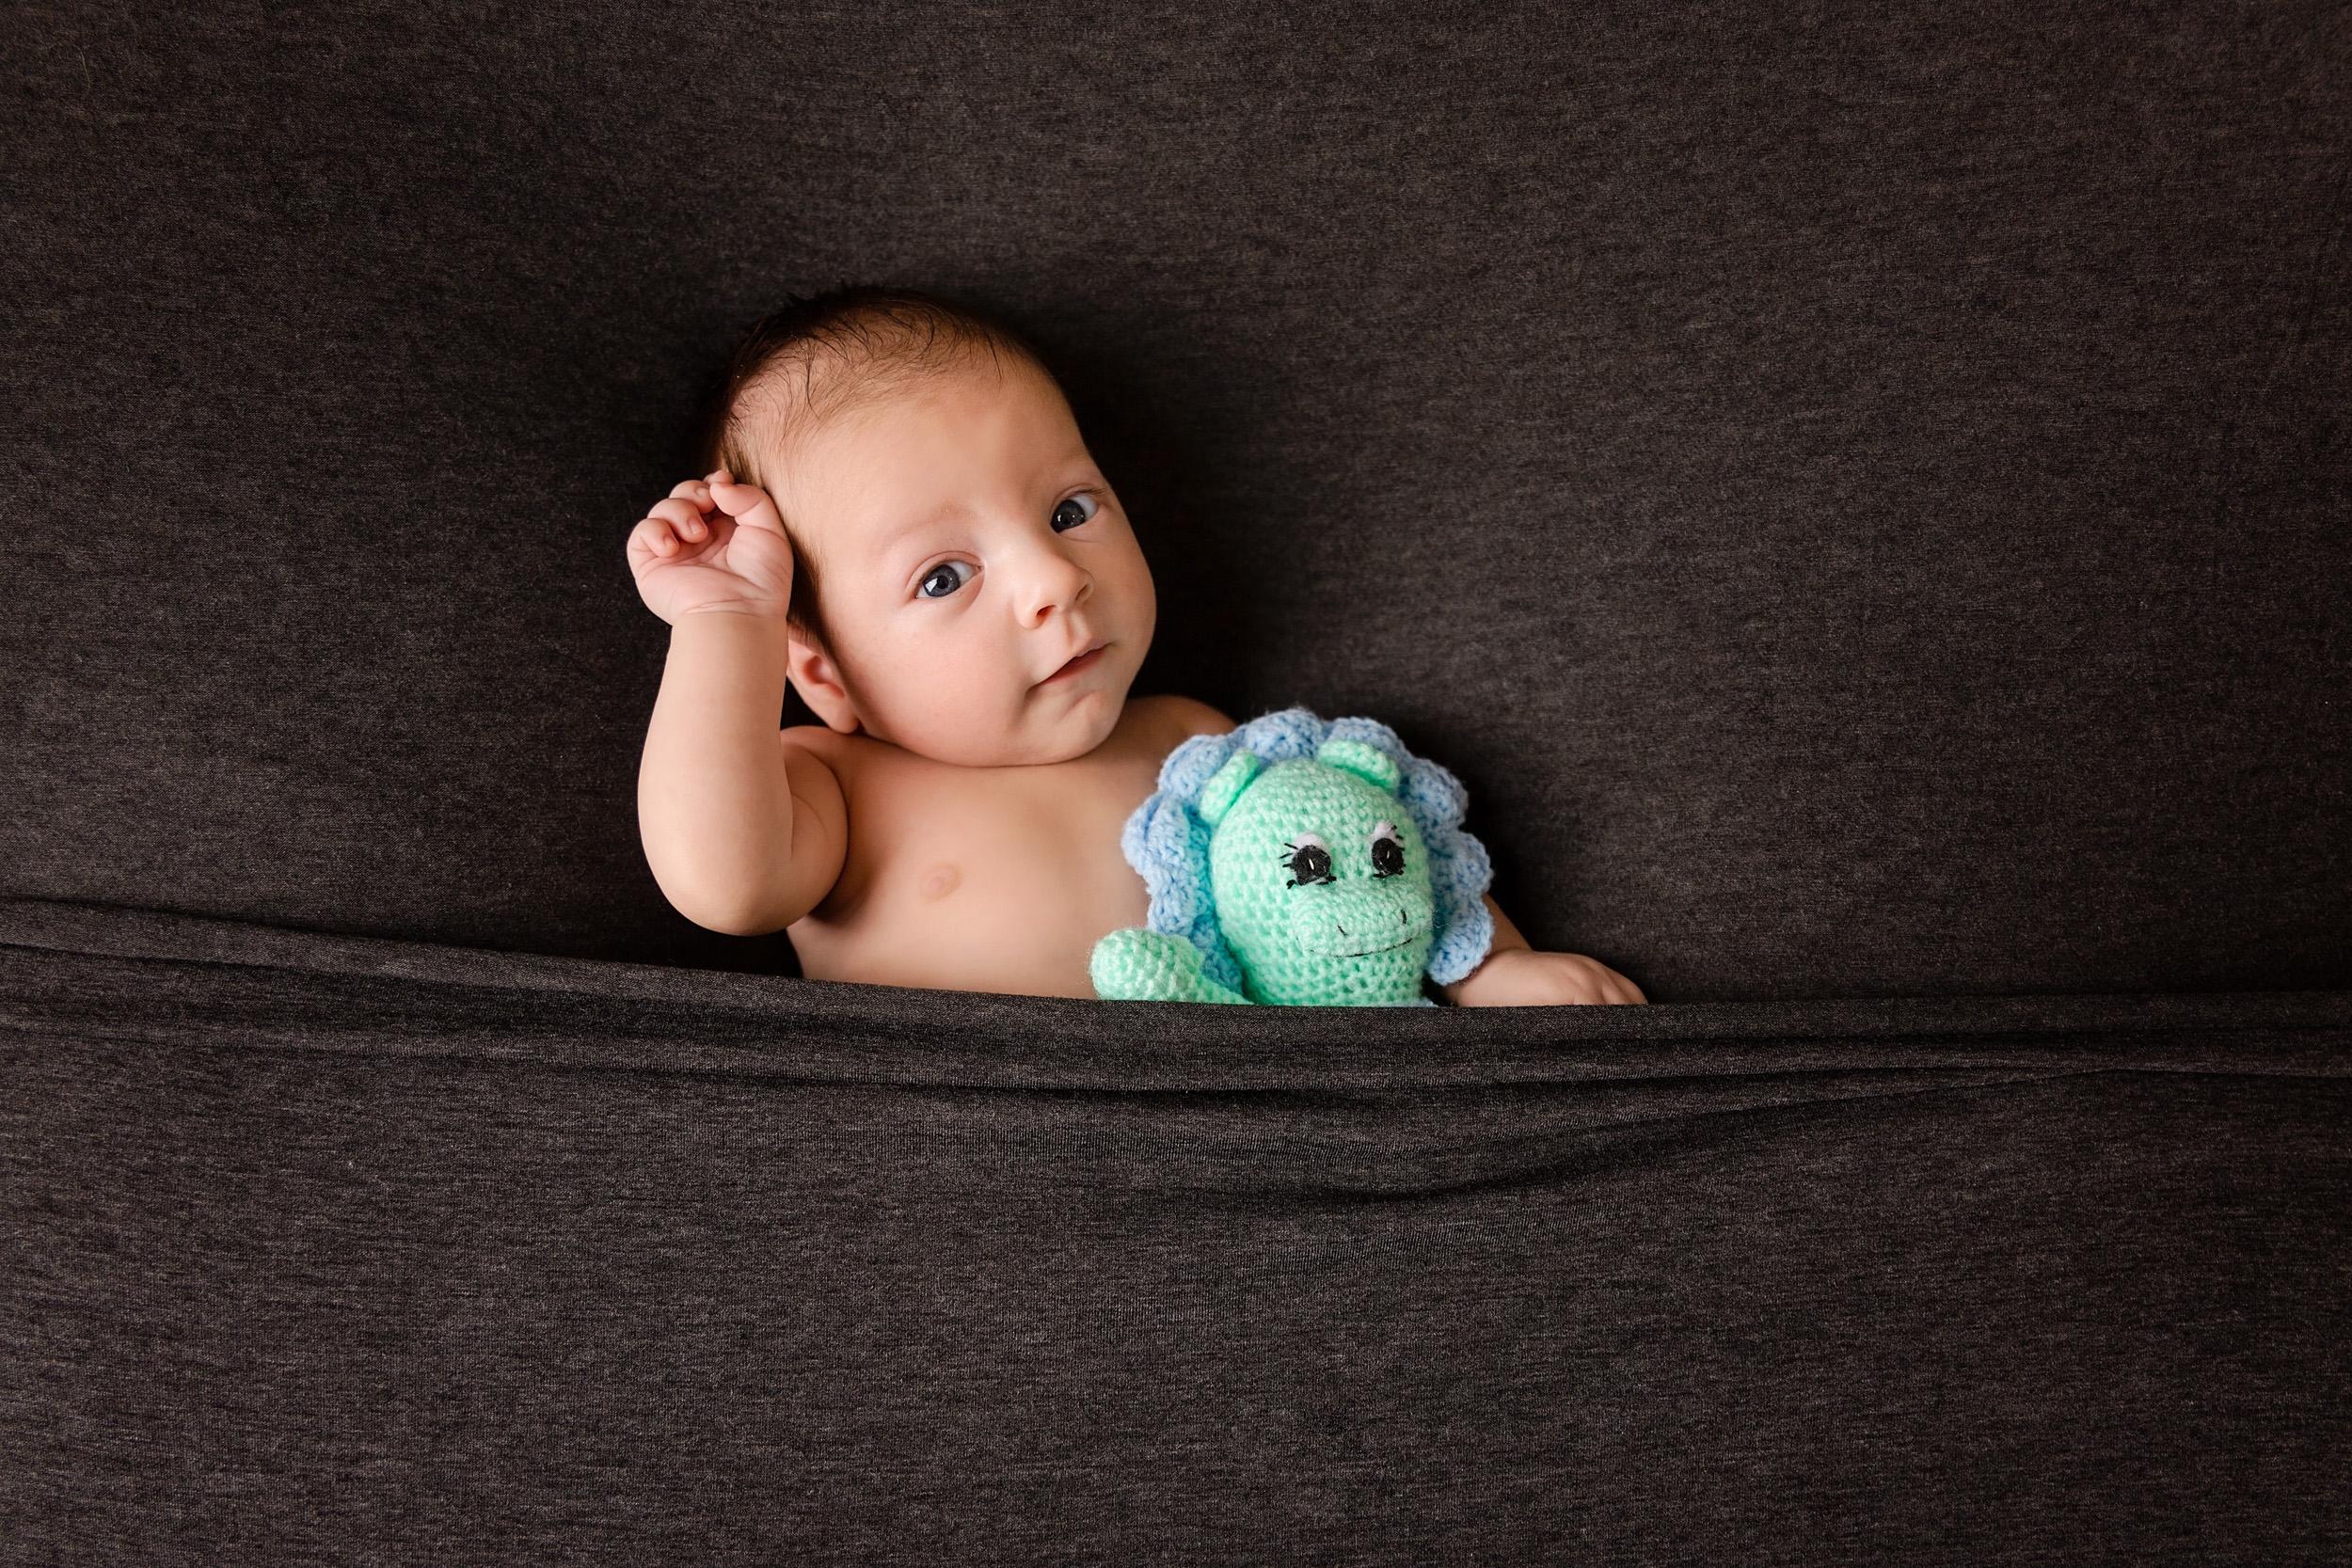 PortraitGallery-041.jpg